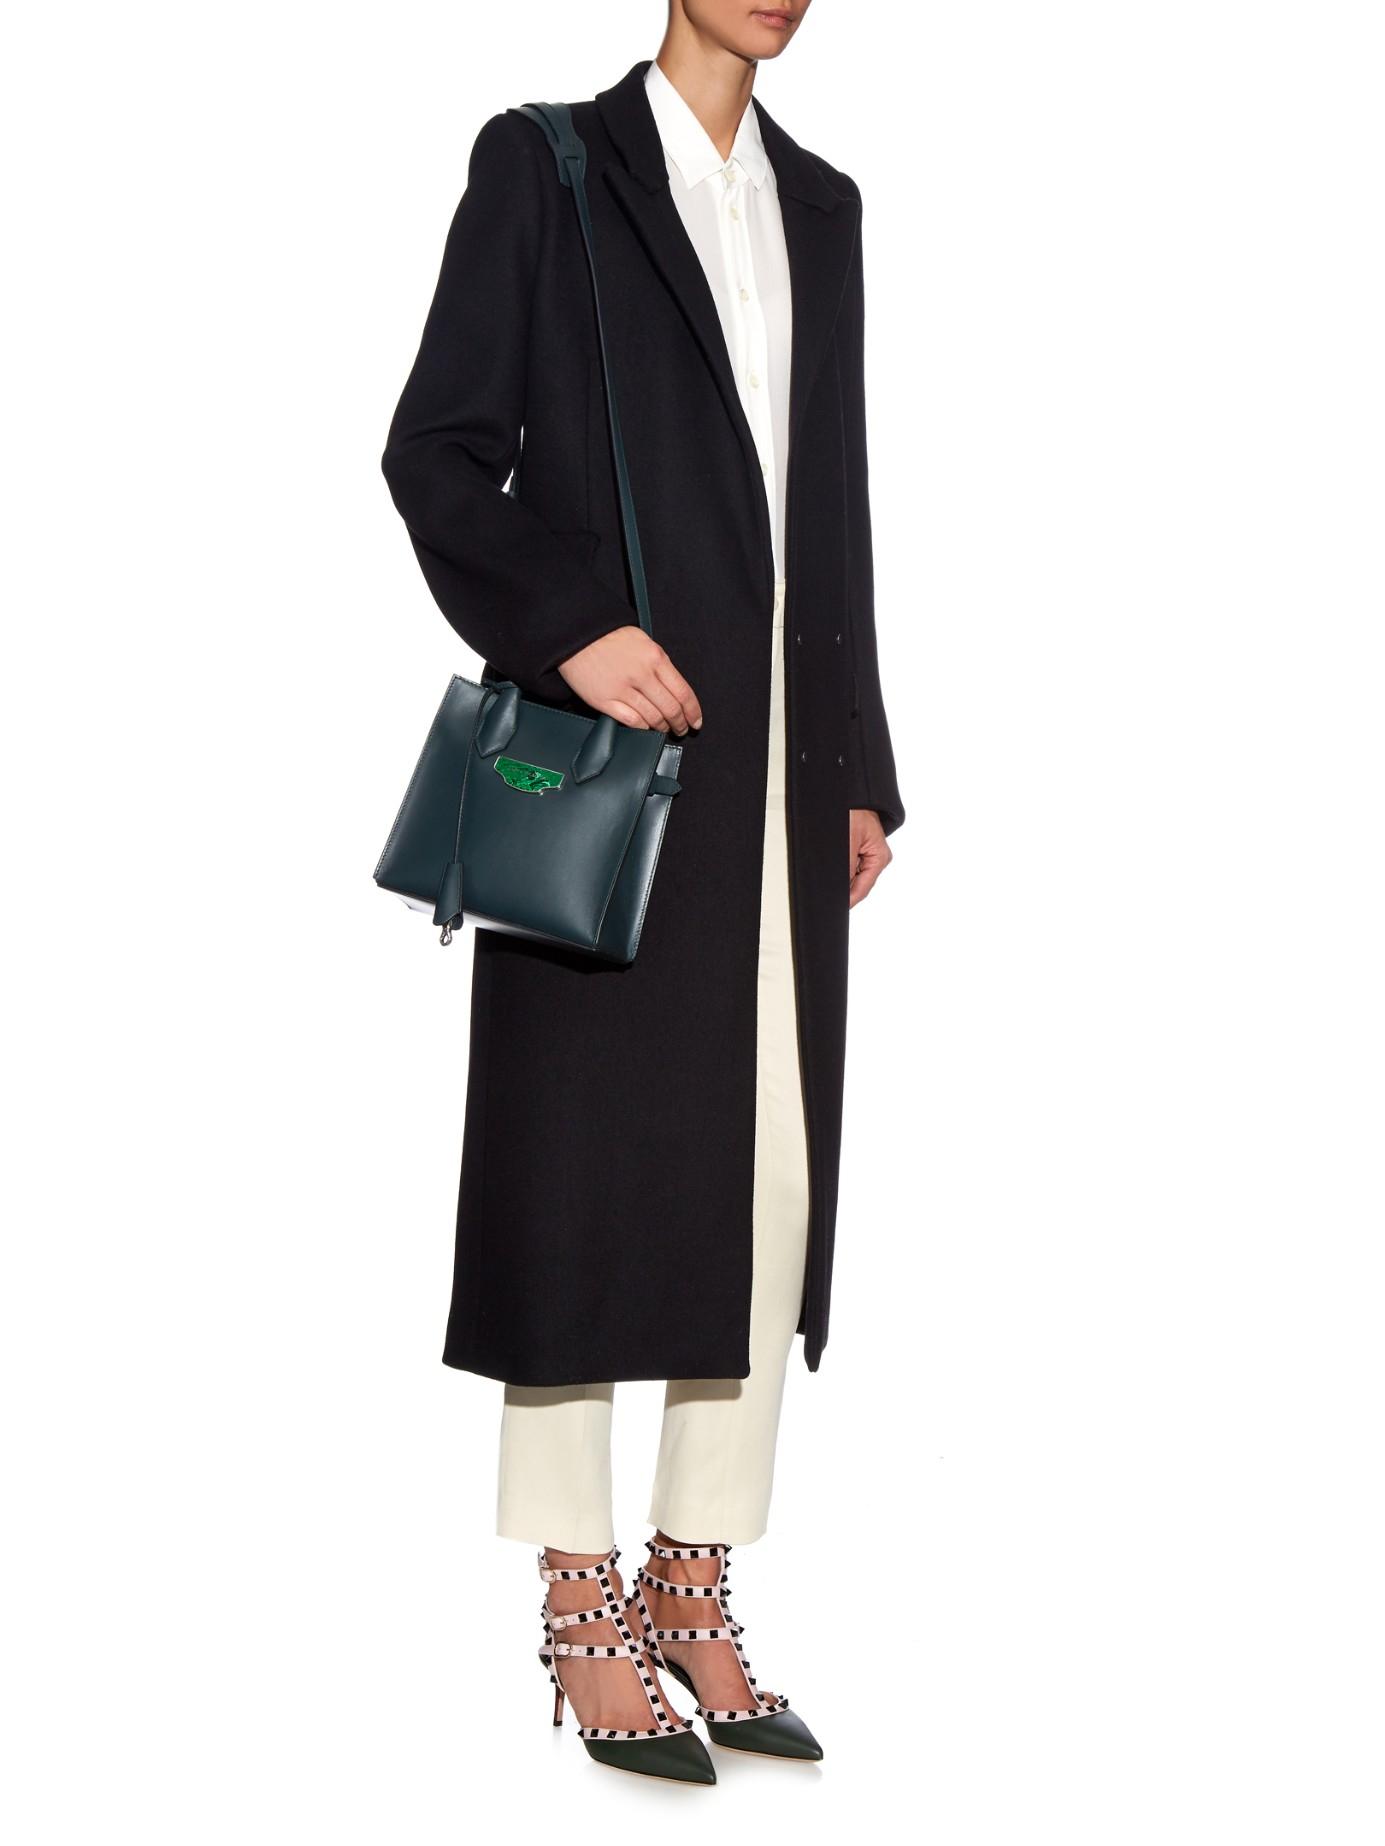 Balenciaga Leather Nude Mini All Afternoon Cross-body Bag in Green